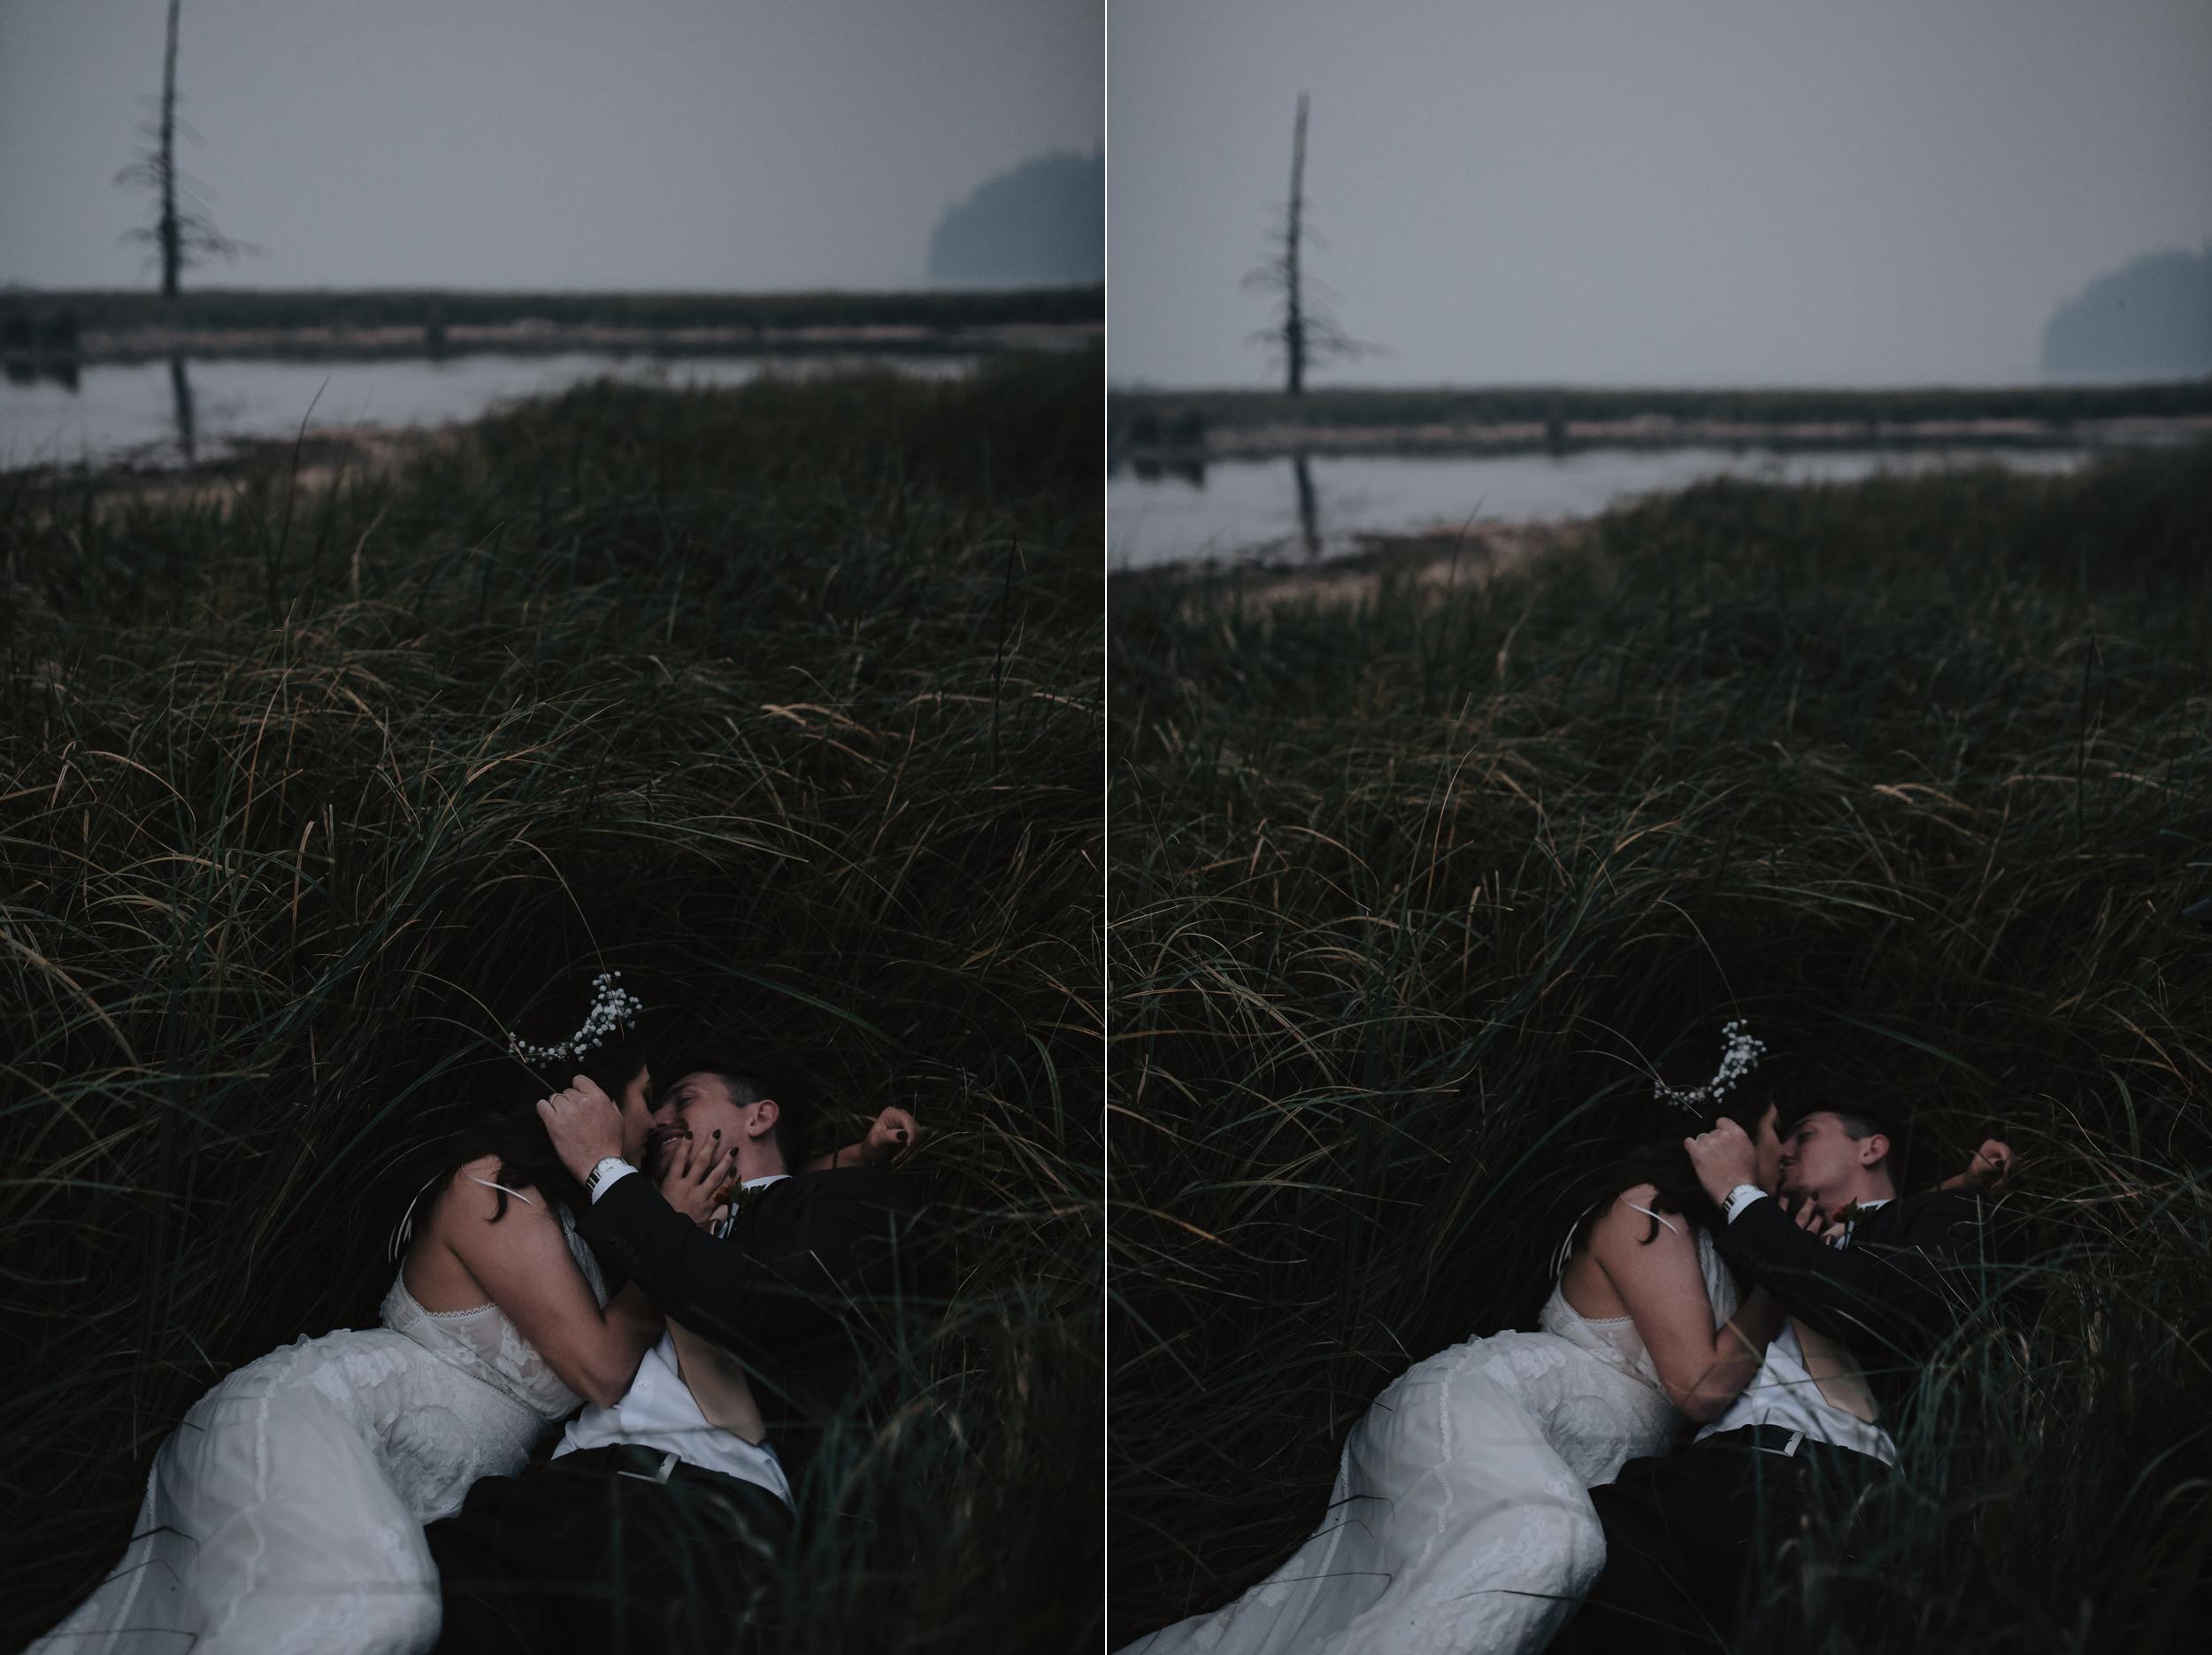 image_066.jpg